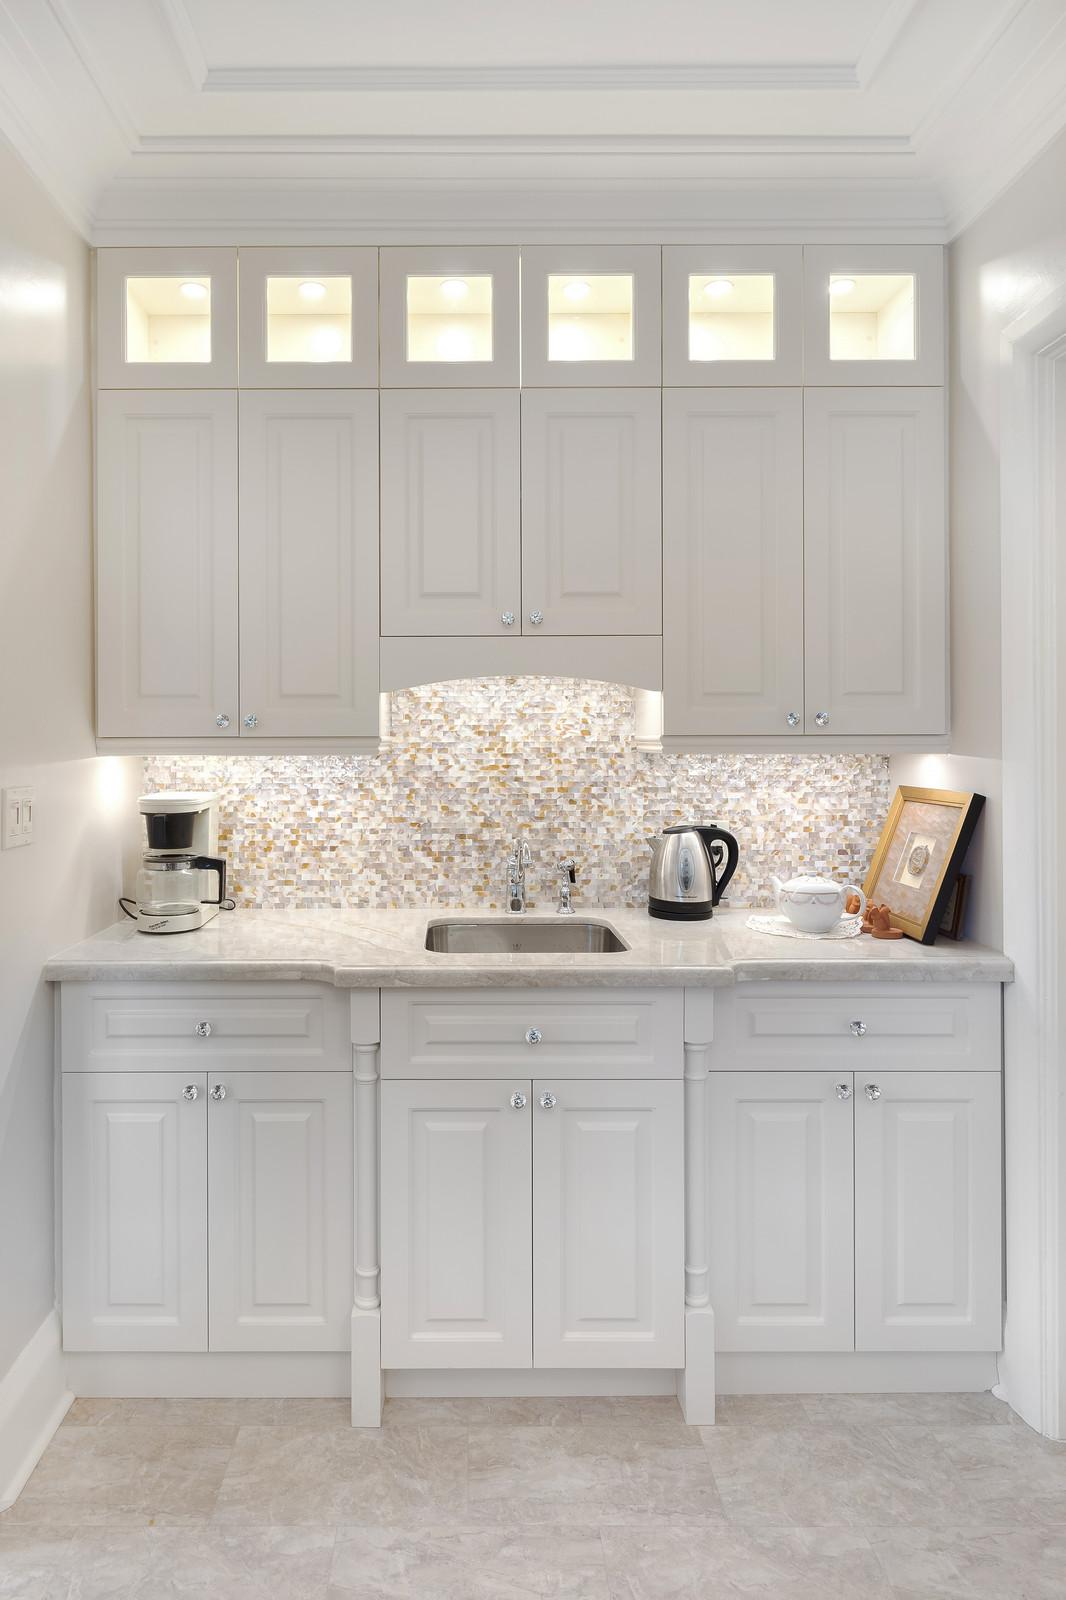 Custom breakfast bar and custom kitchen cabinets